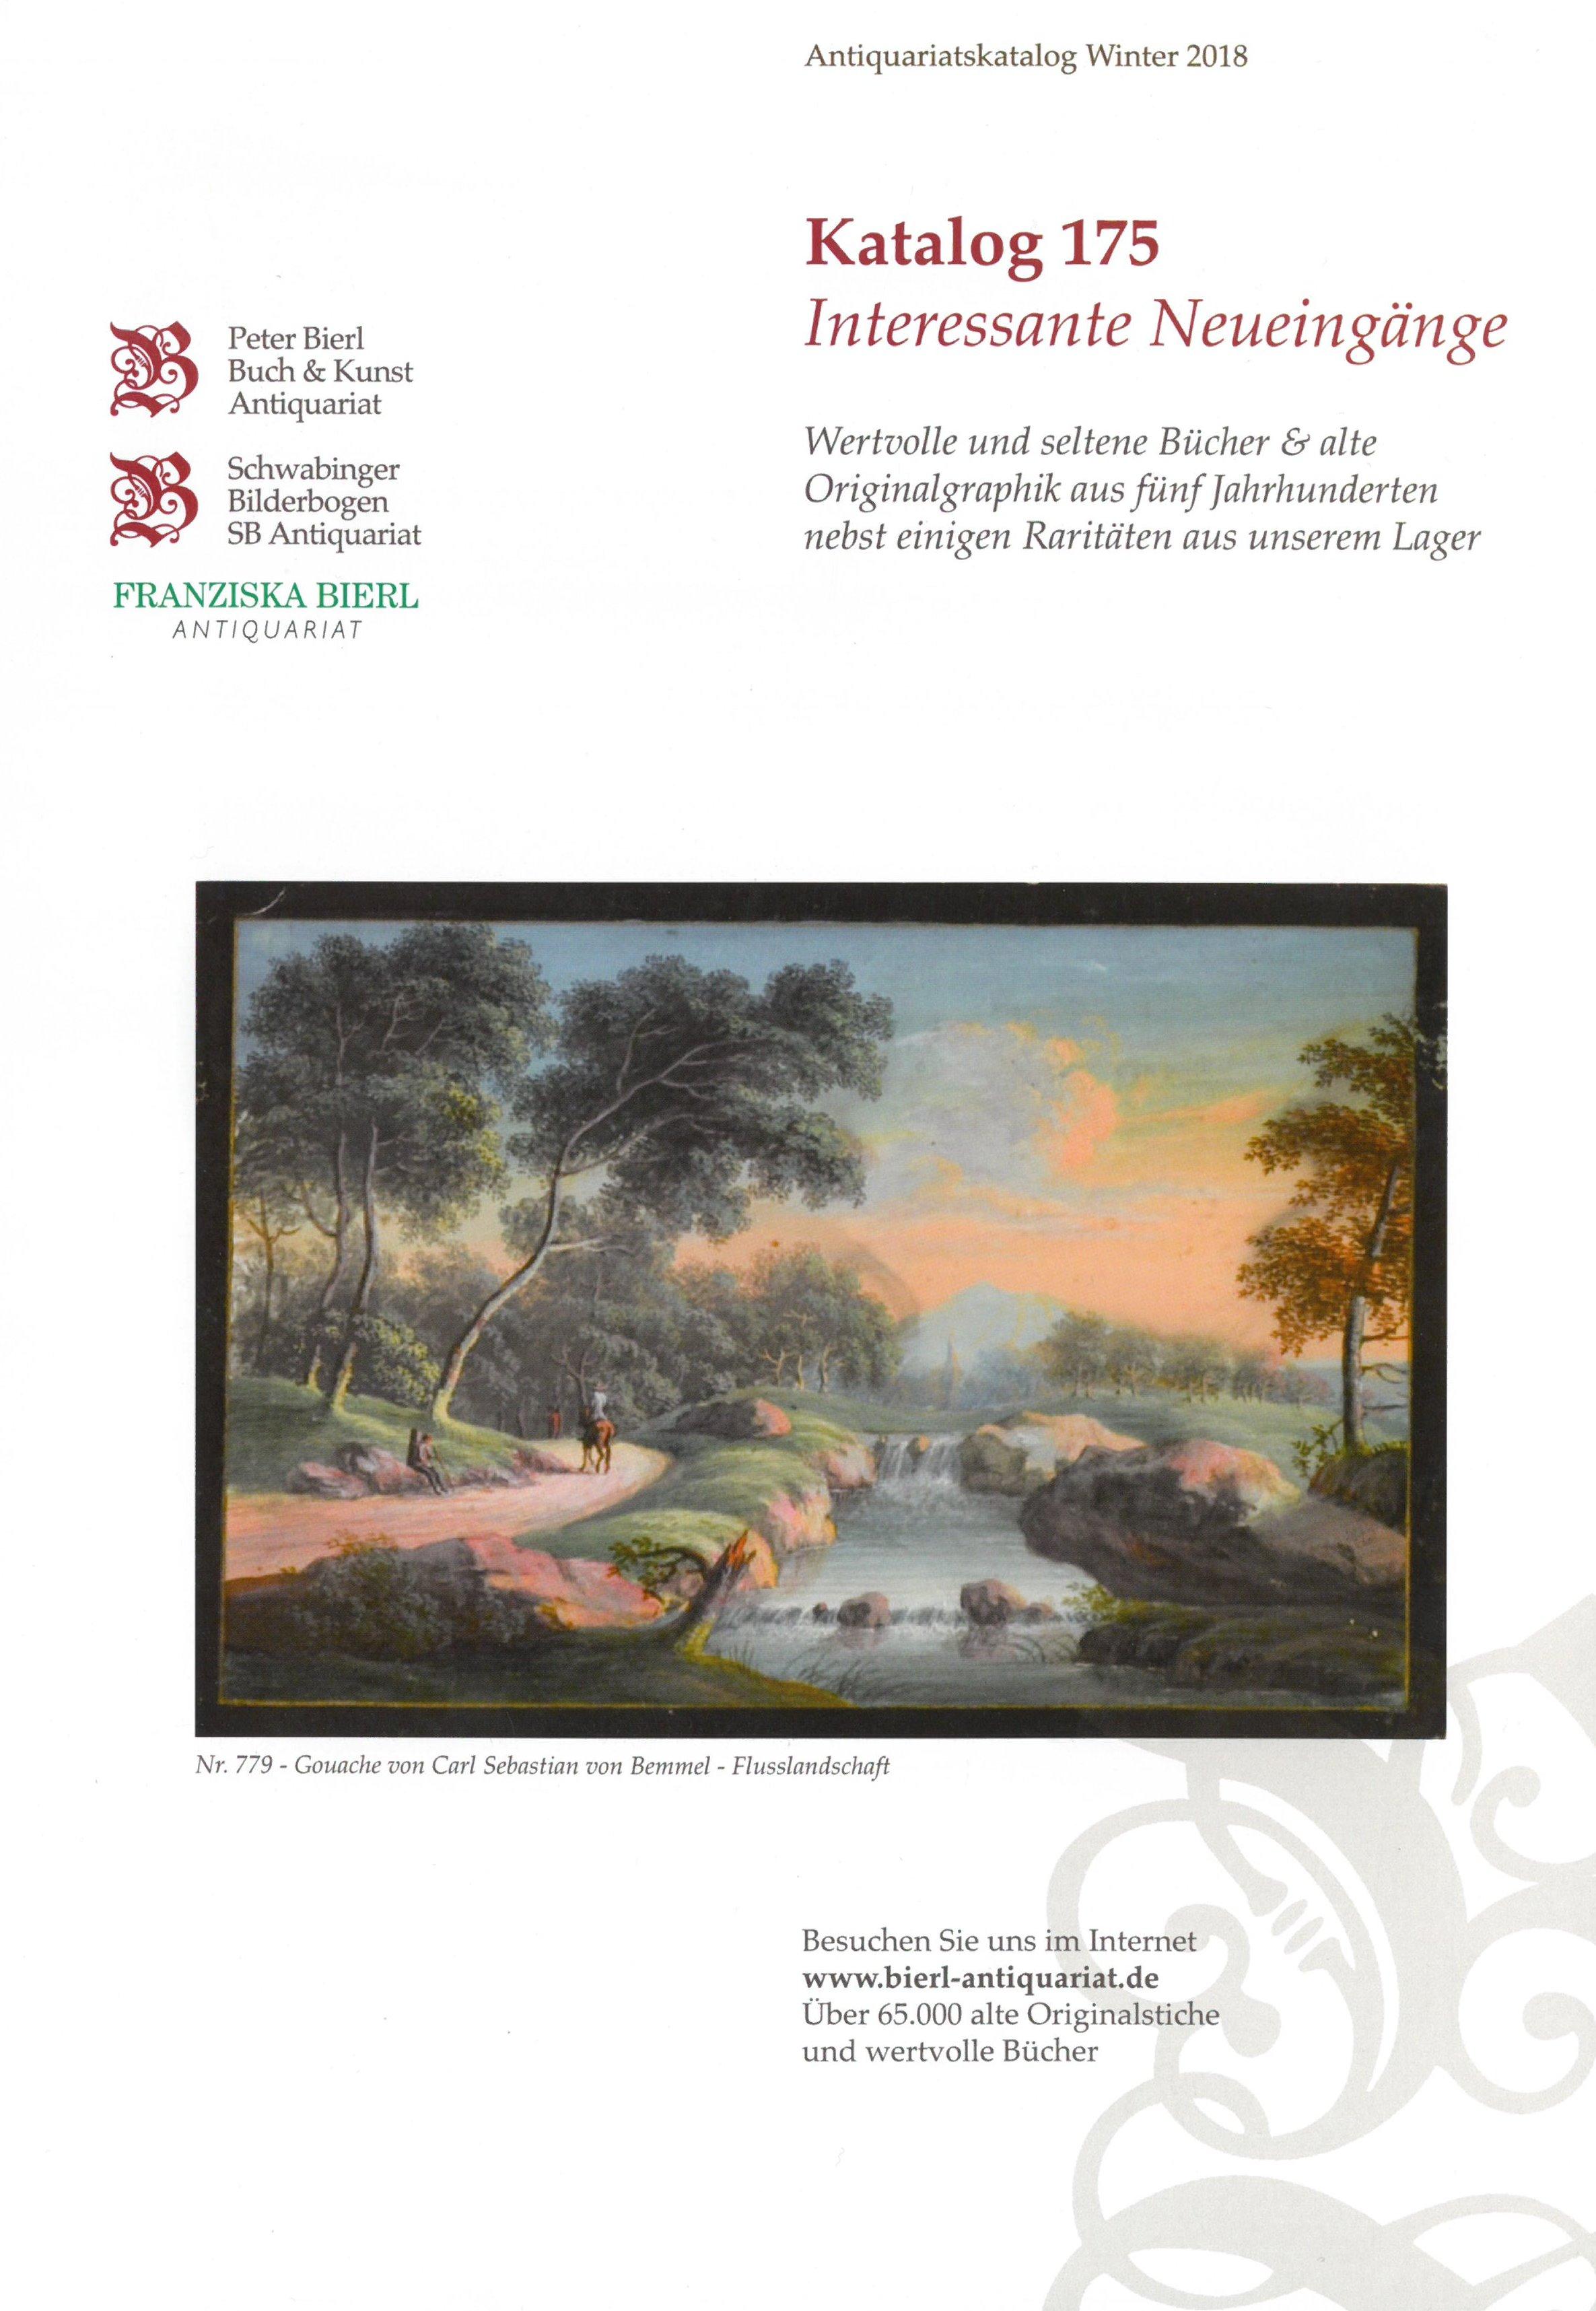 Katalog 175 - Interessante Neueingänge